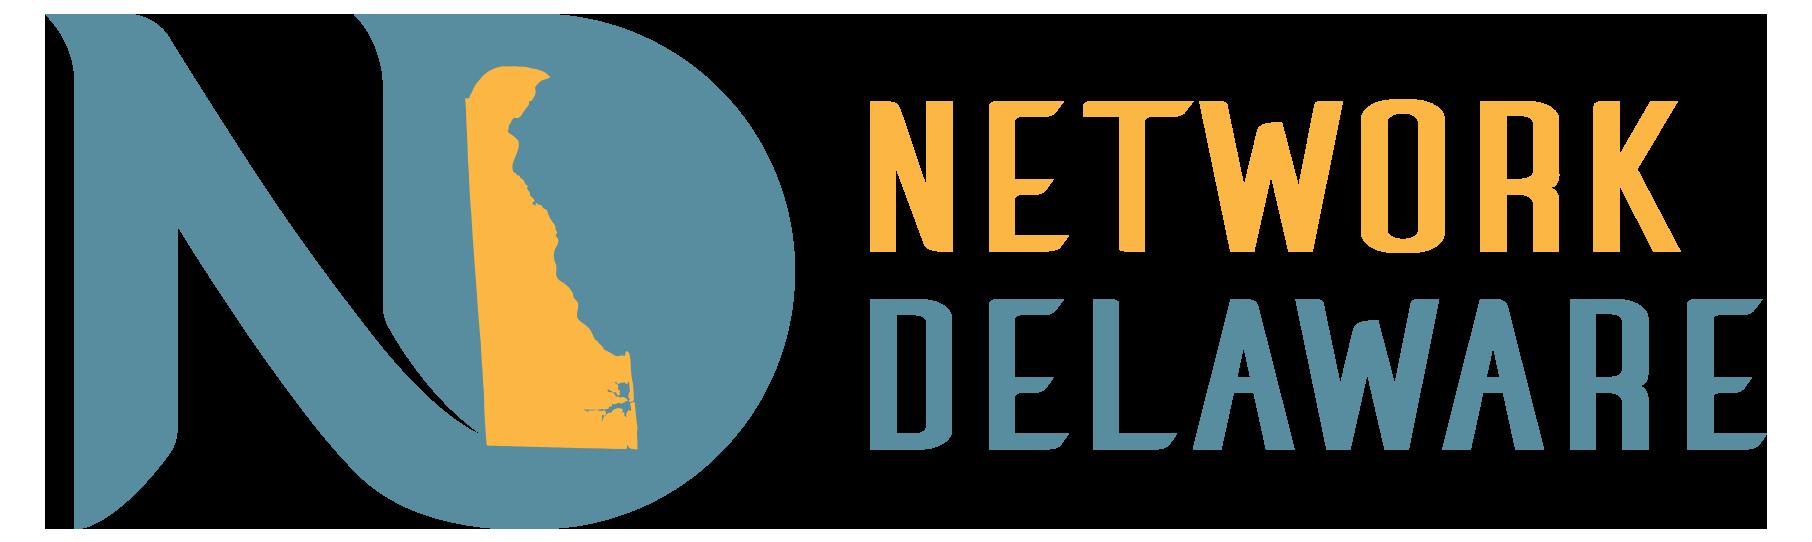 Network Delaware